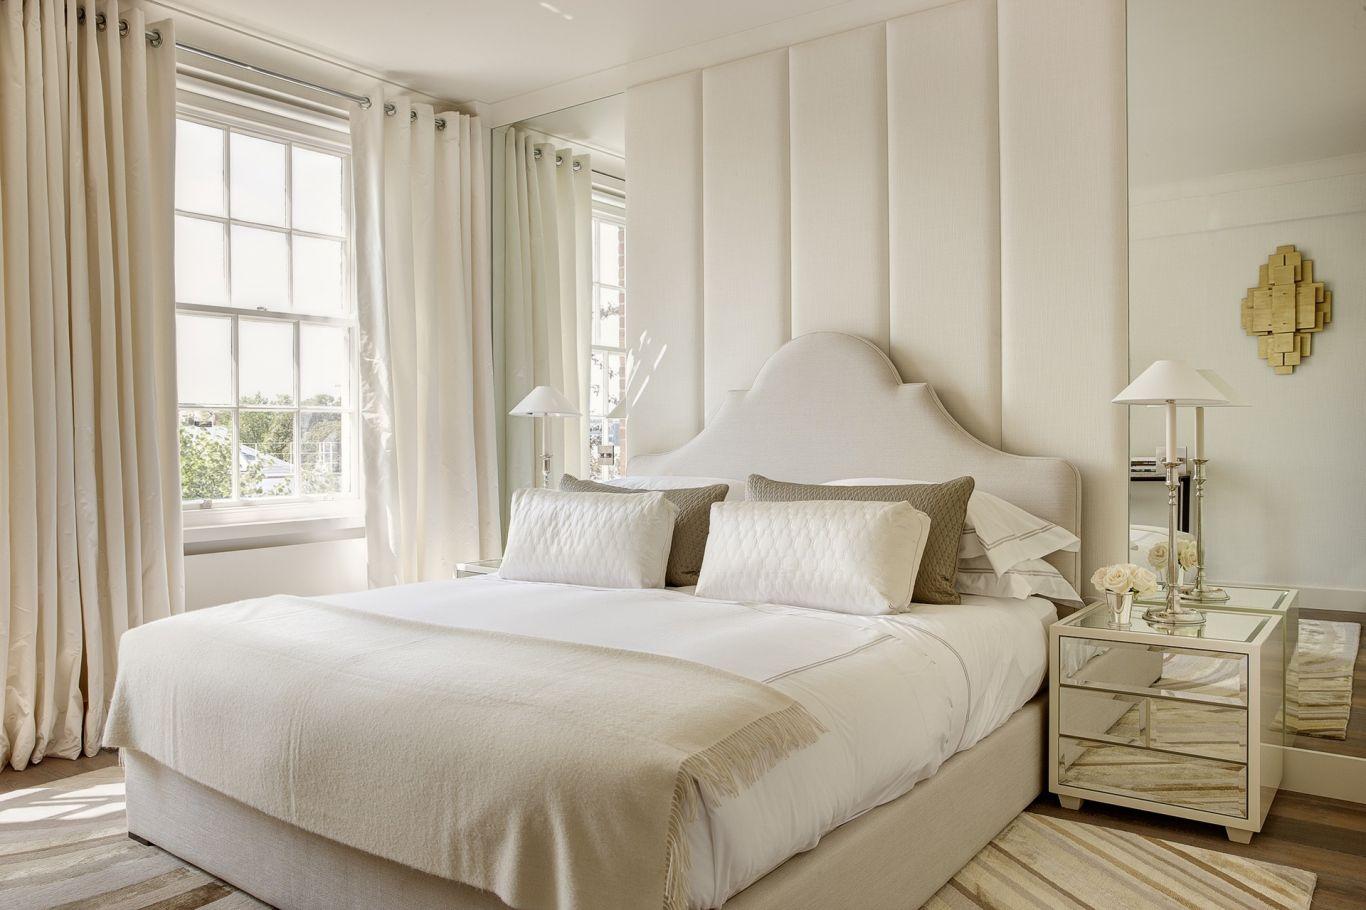 Interior bedroom design with smart features